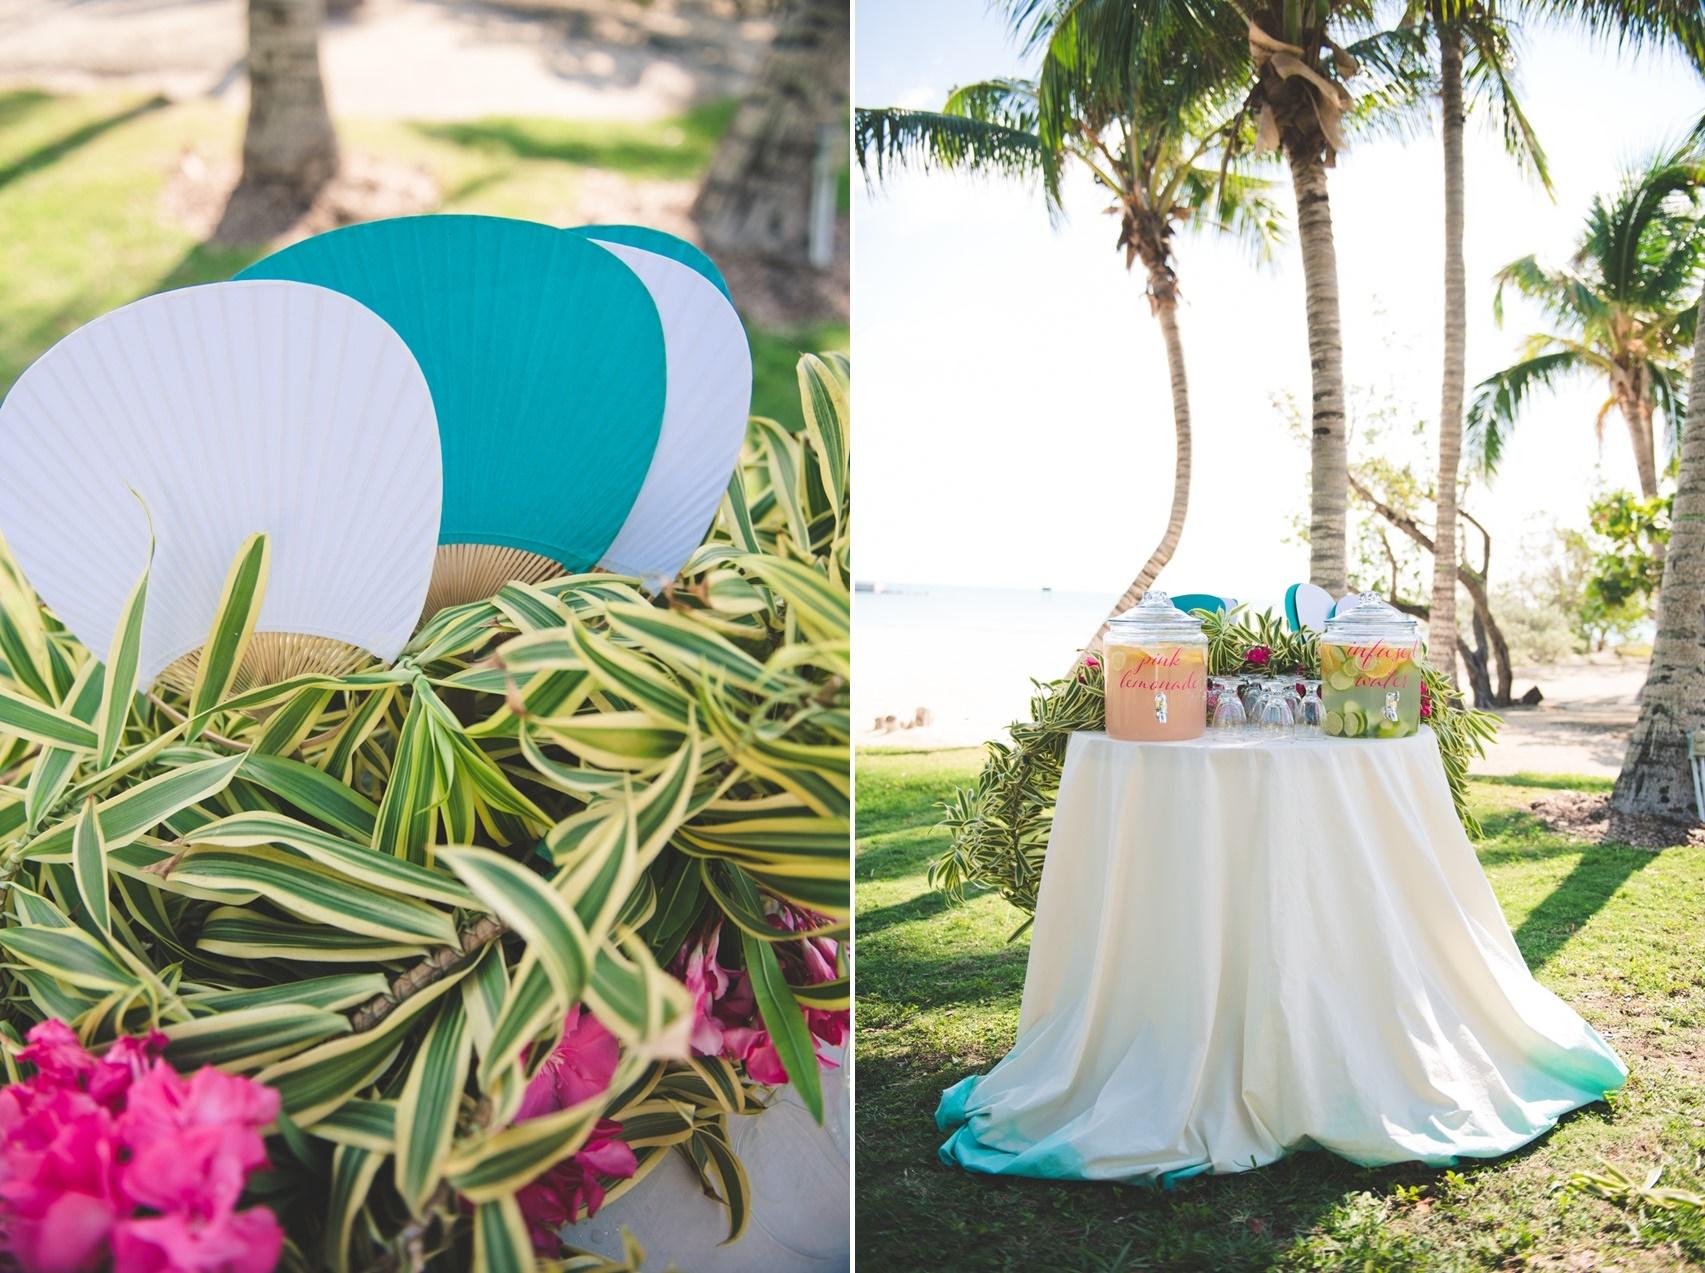 Beach Wedding Fans & Drink Station